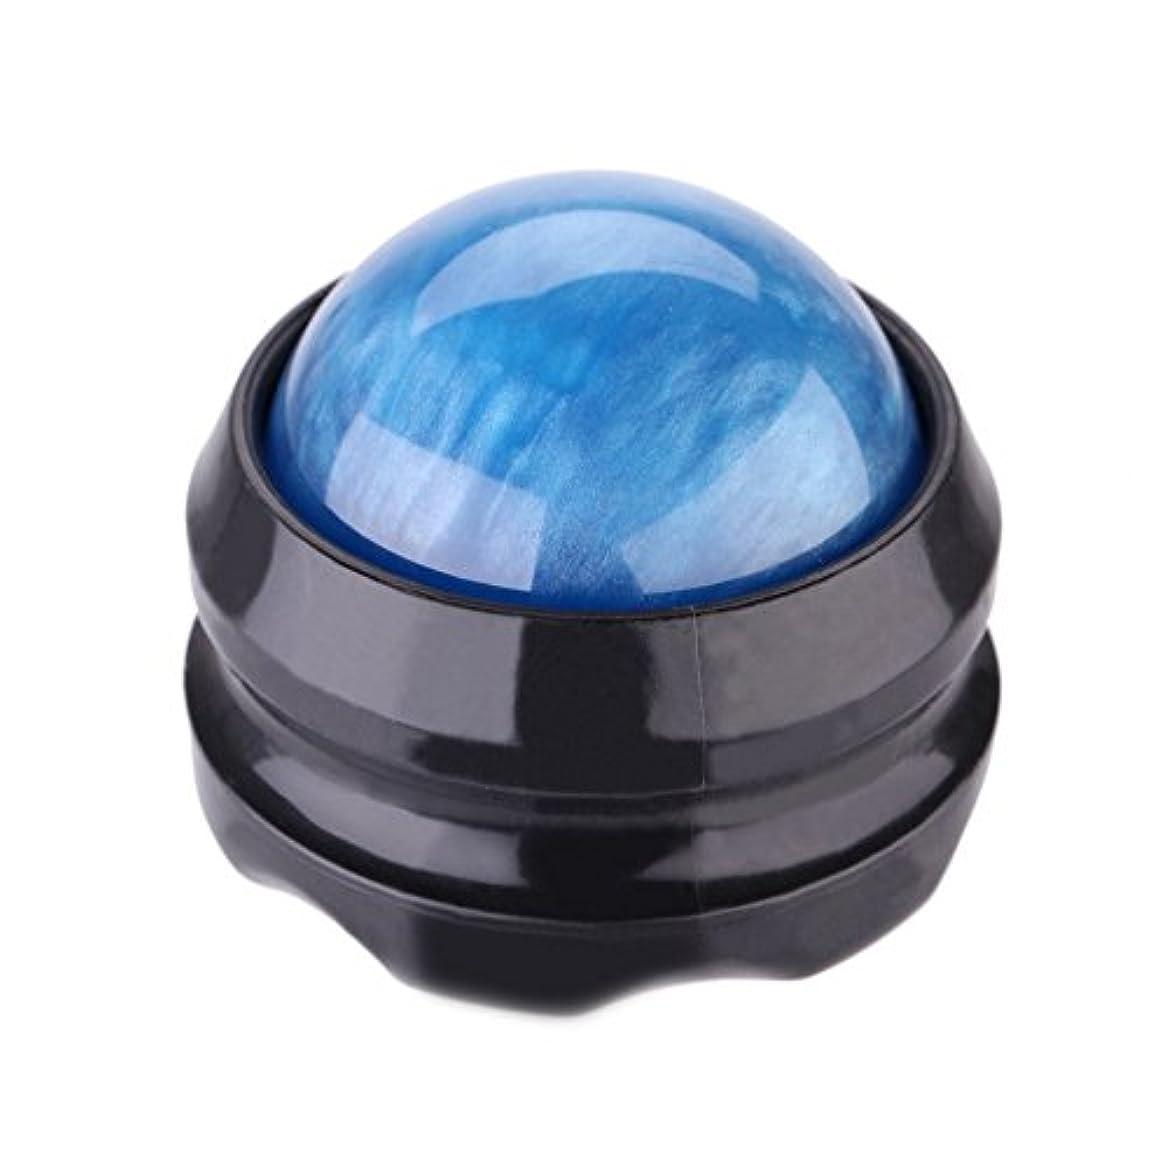 Flymylion マッサージ ボール 360度回転 背中 首 腰 筋膜リリース 健康器具 (青)